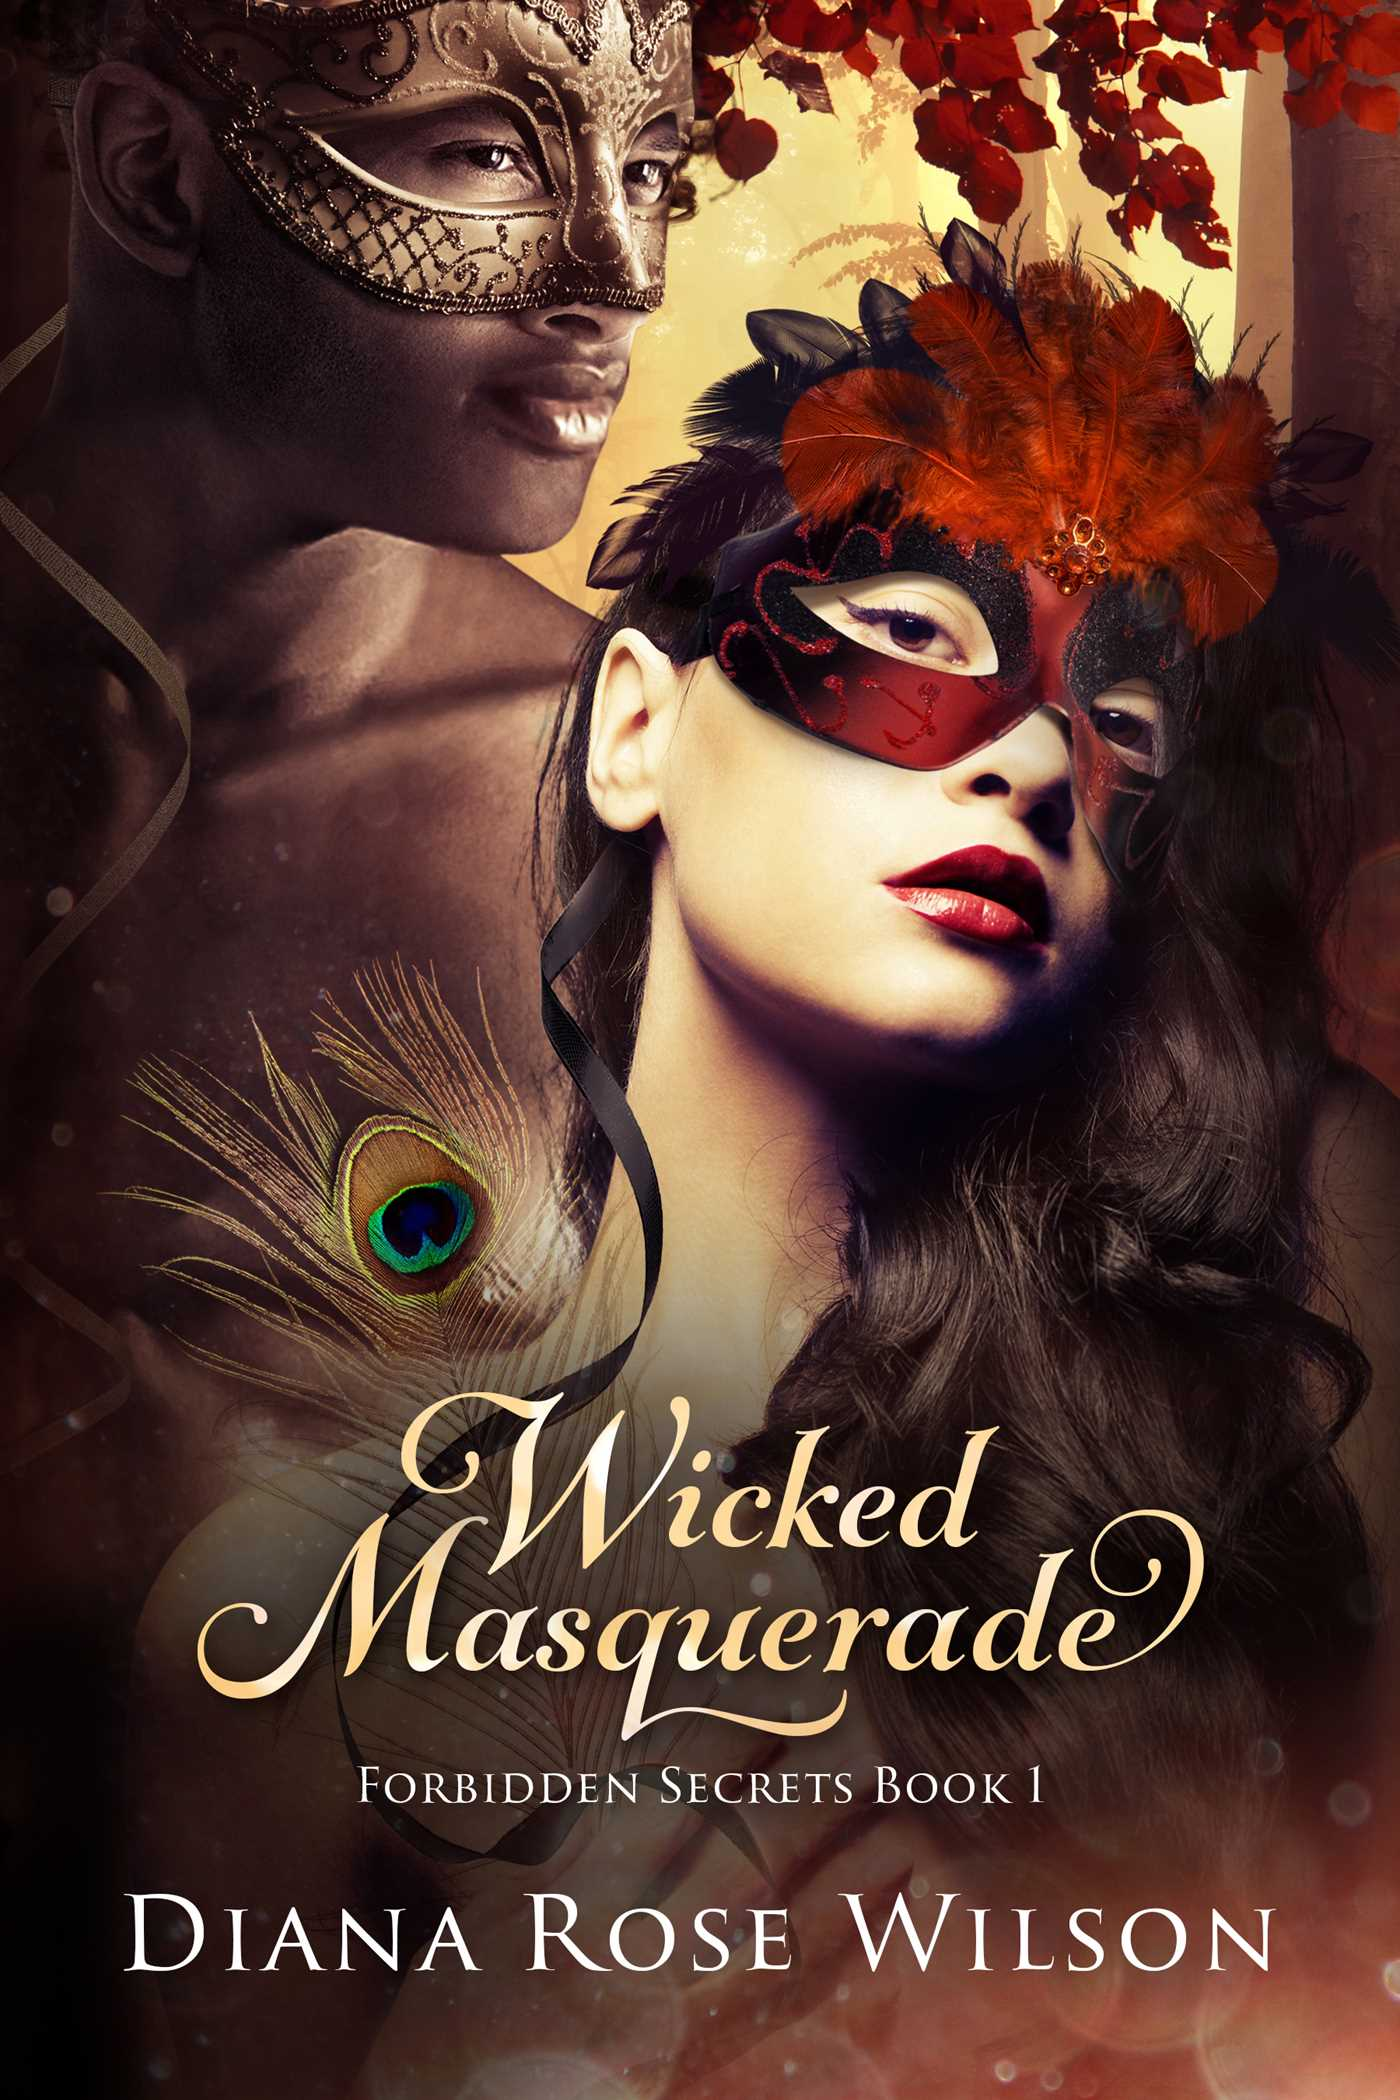 Wicked masquerade 9781682992517 hr